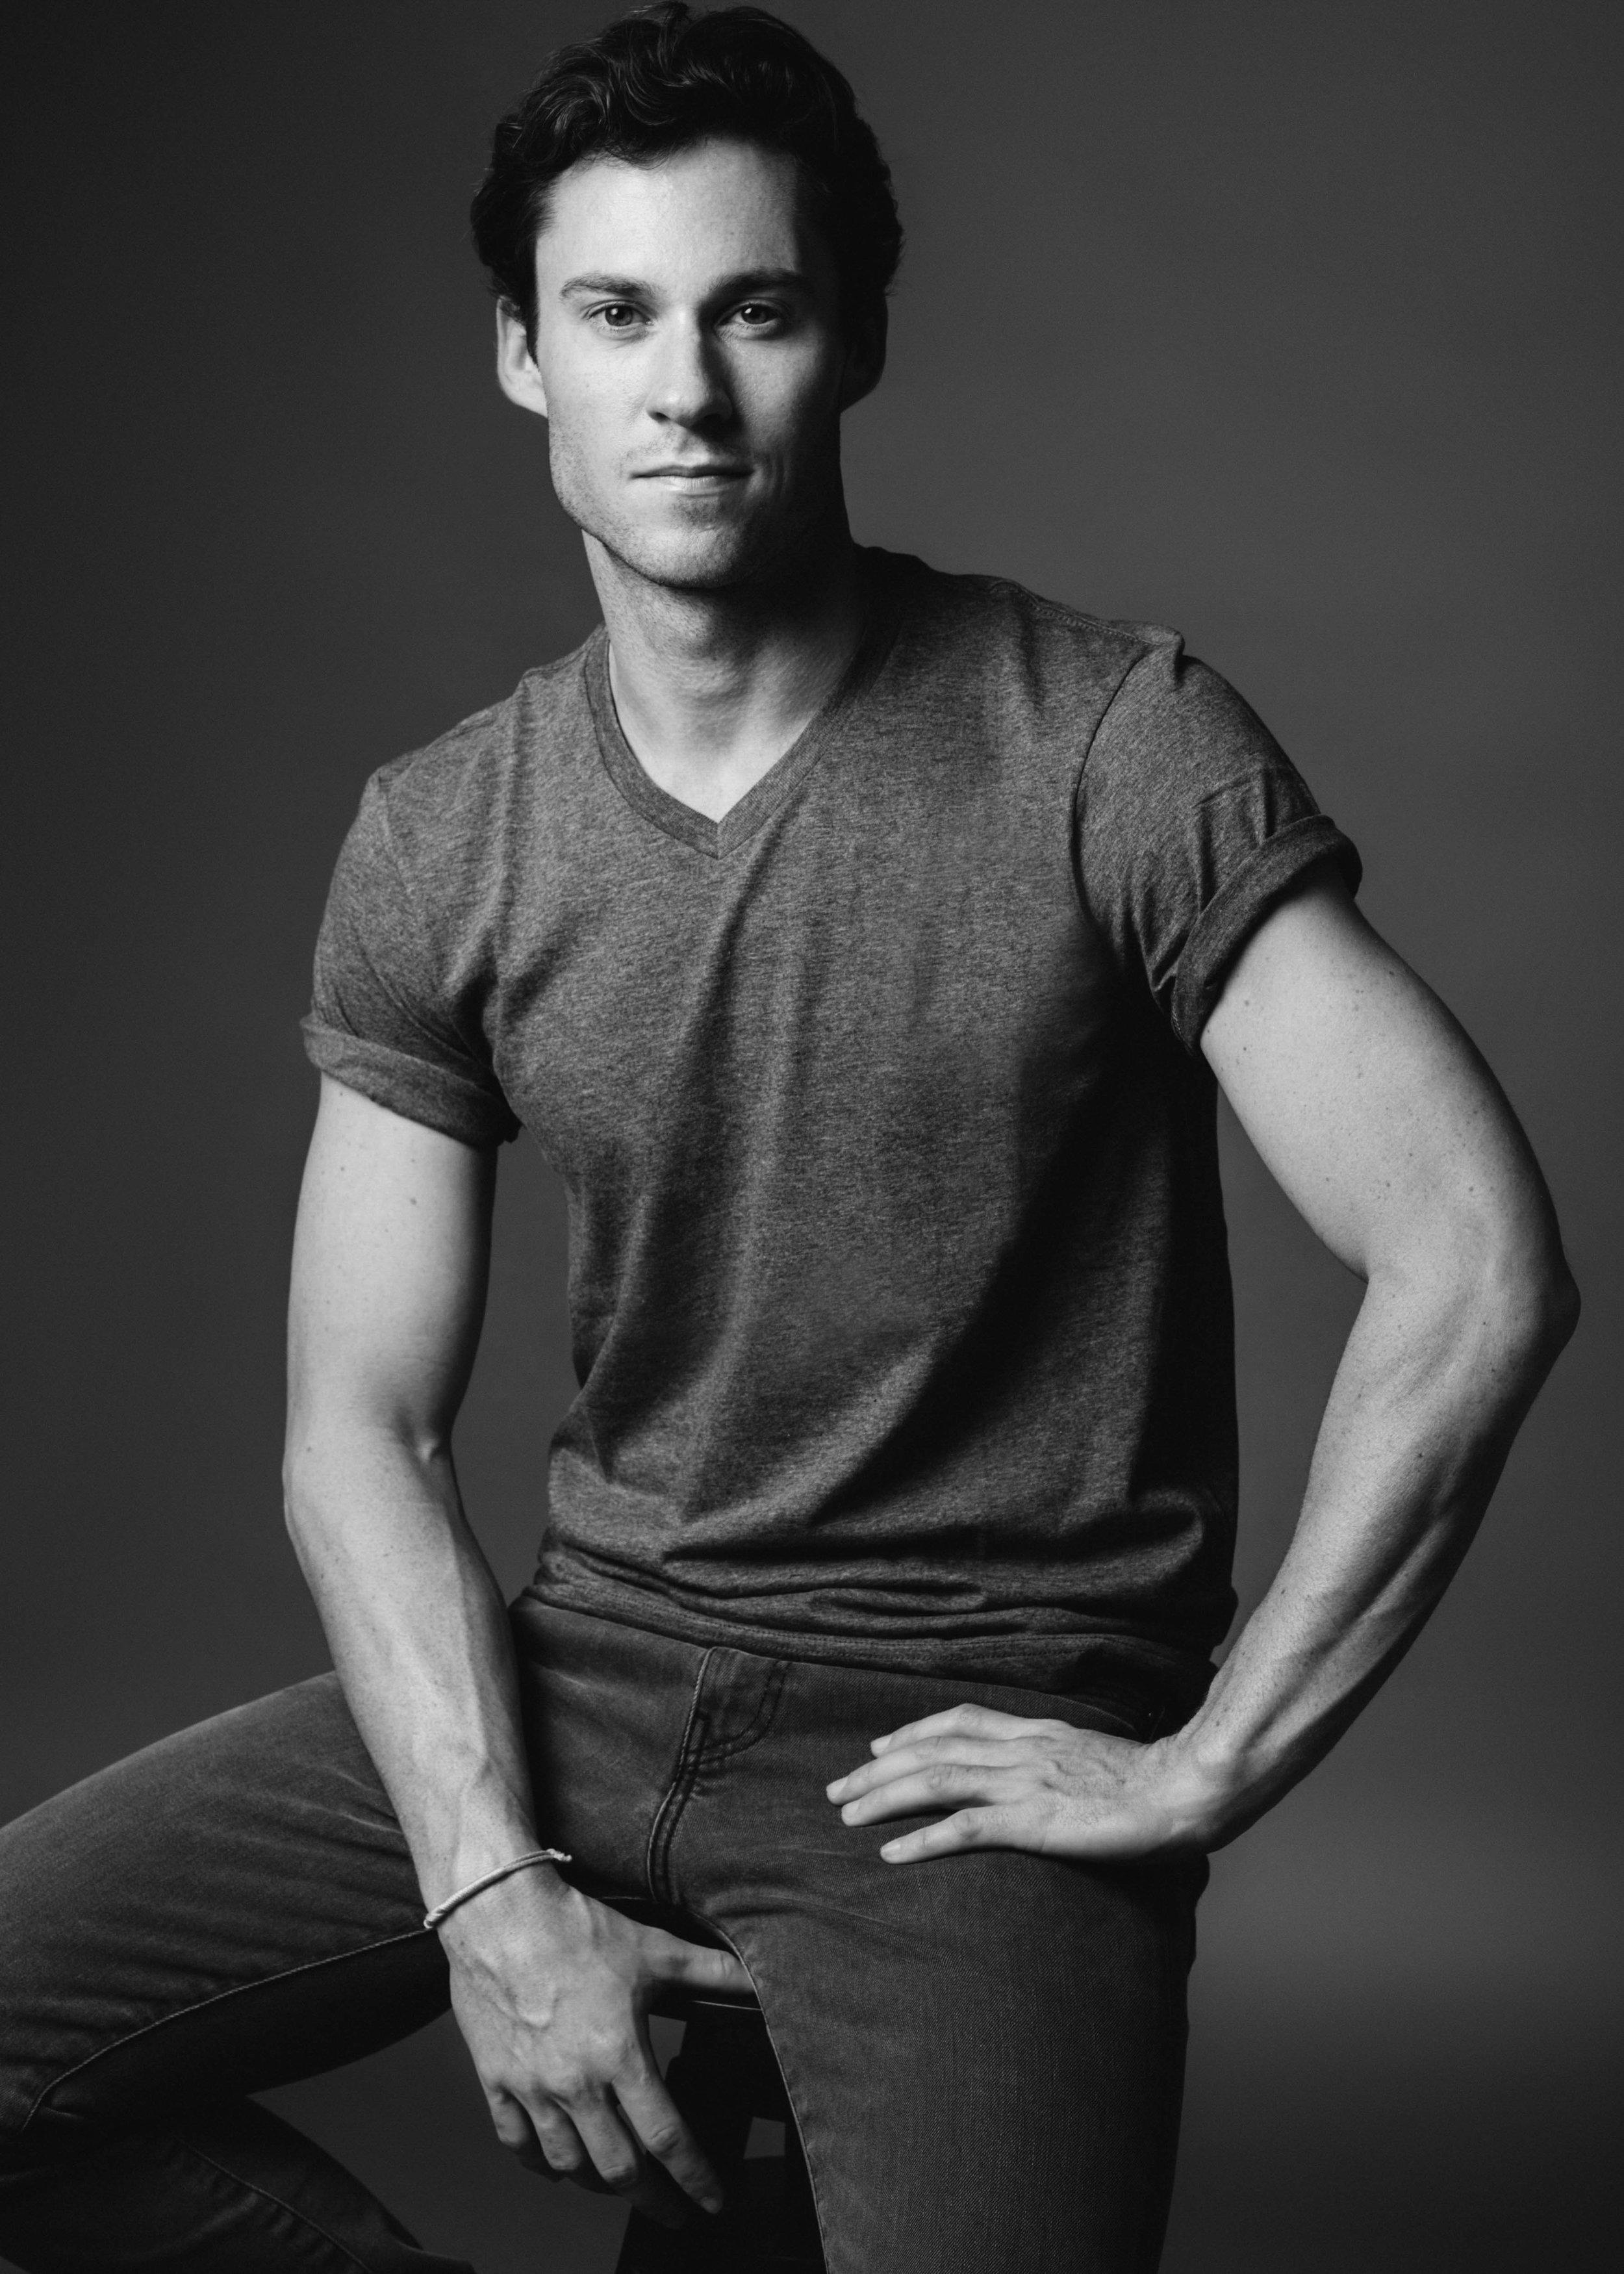 nyc-photographers-male-model-test-10009.jpg